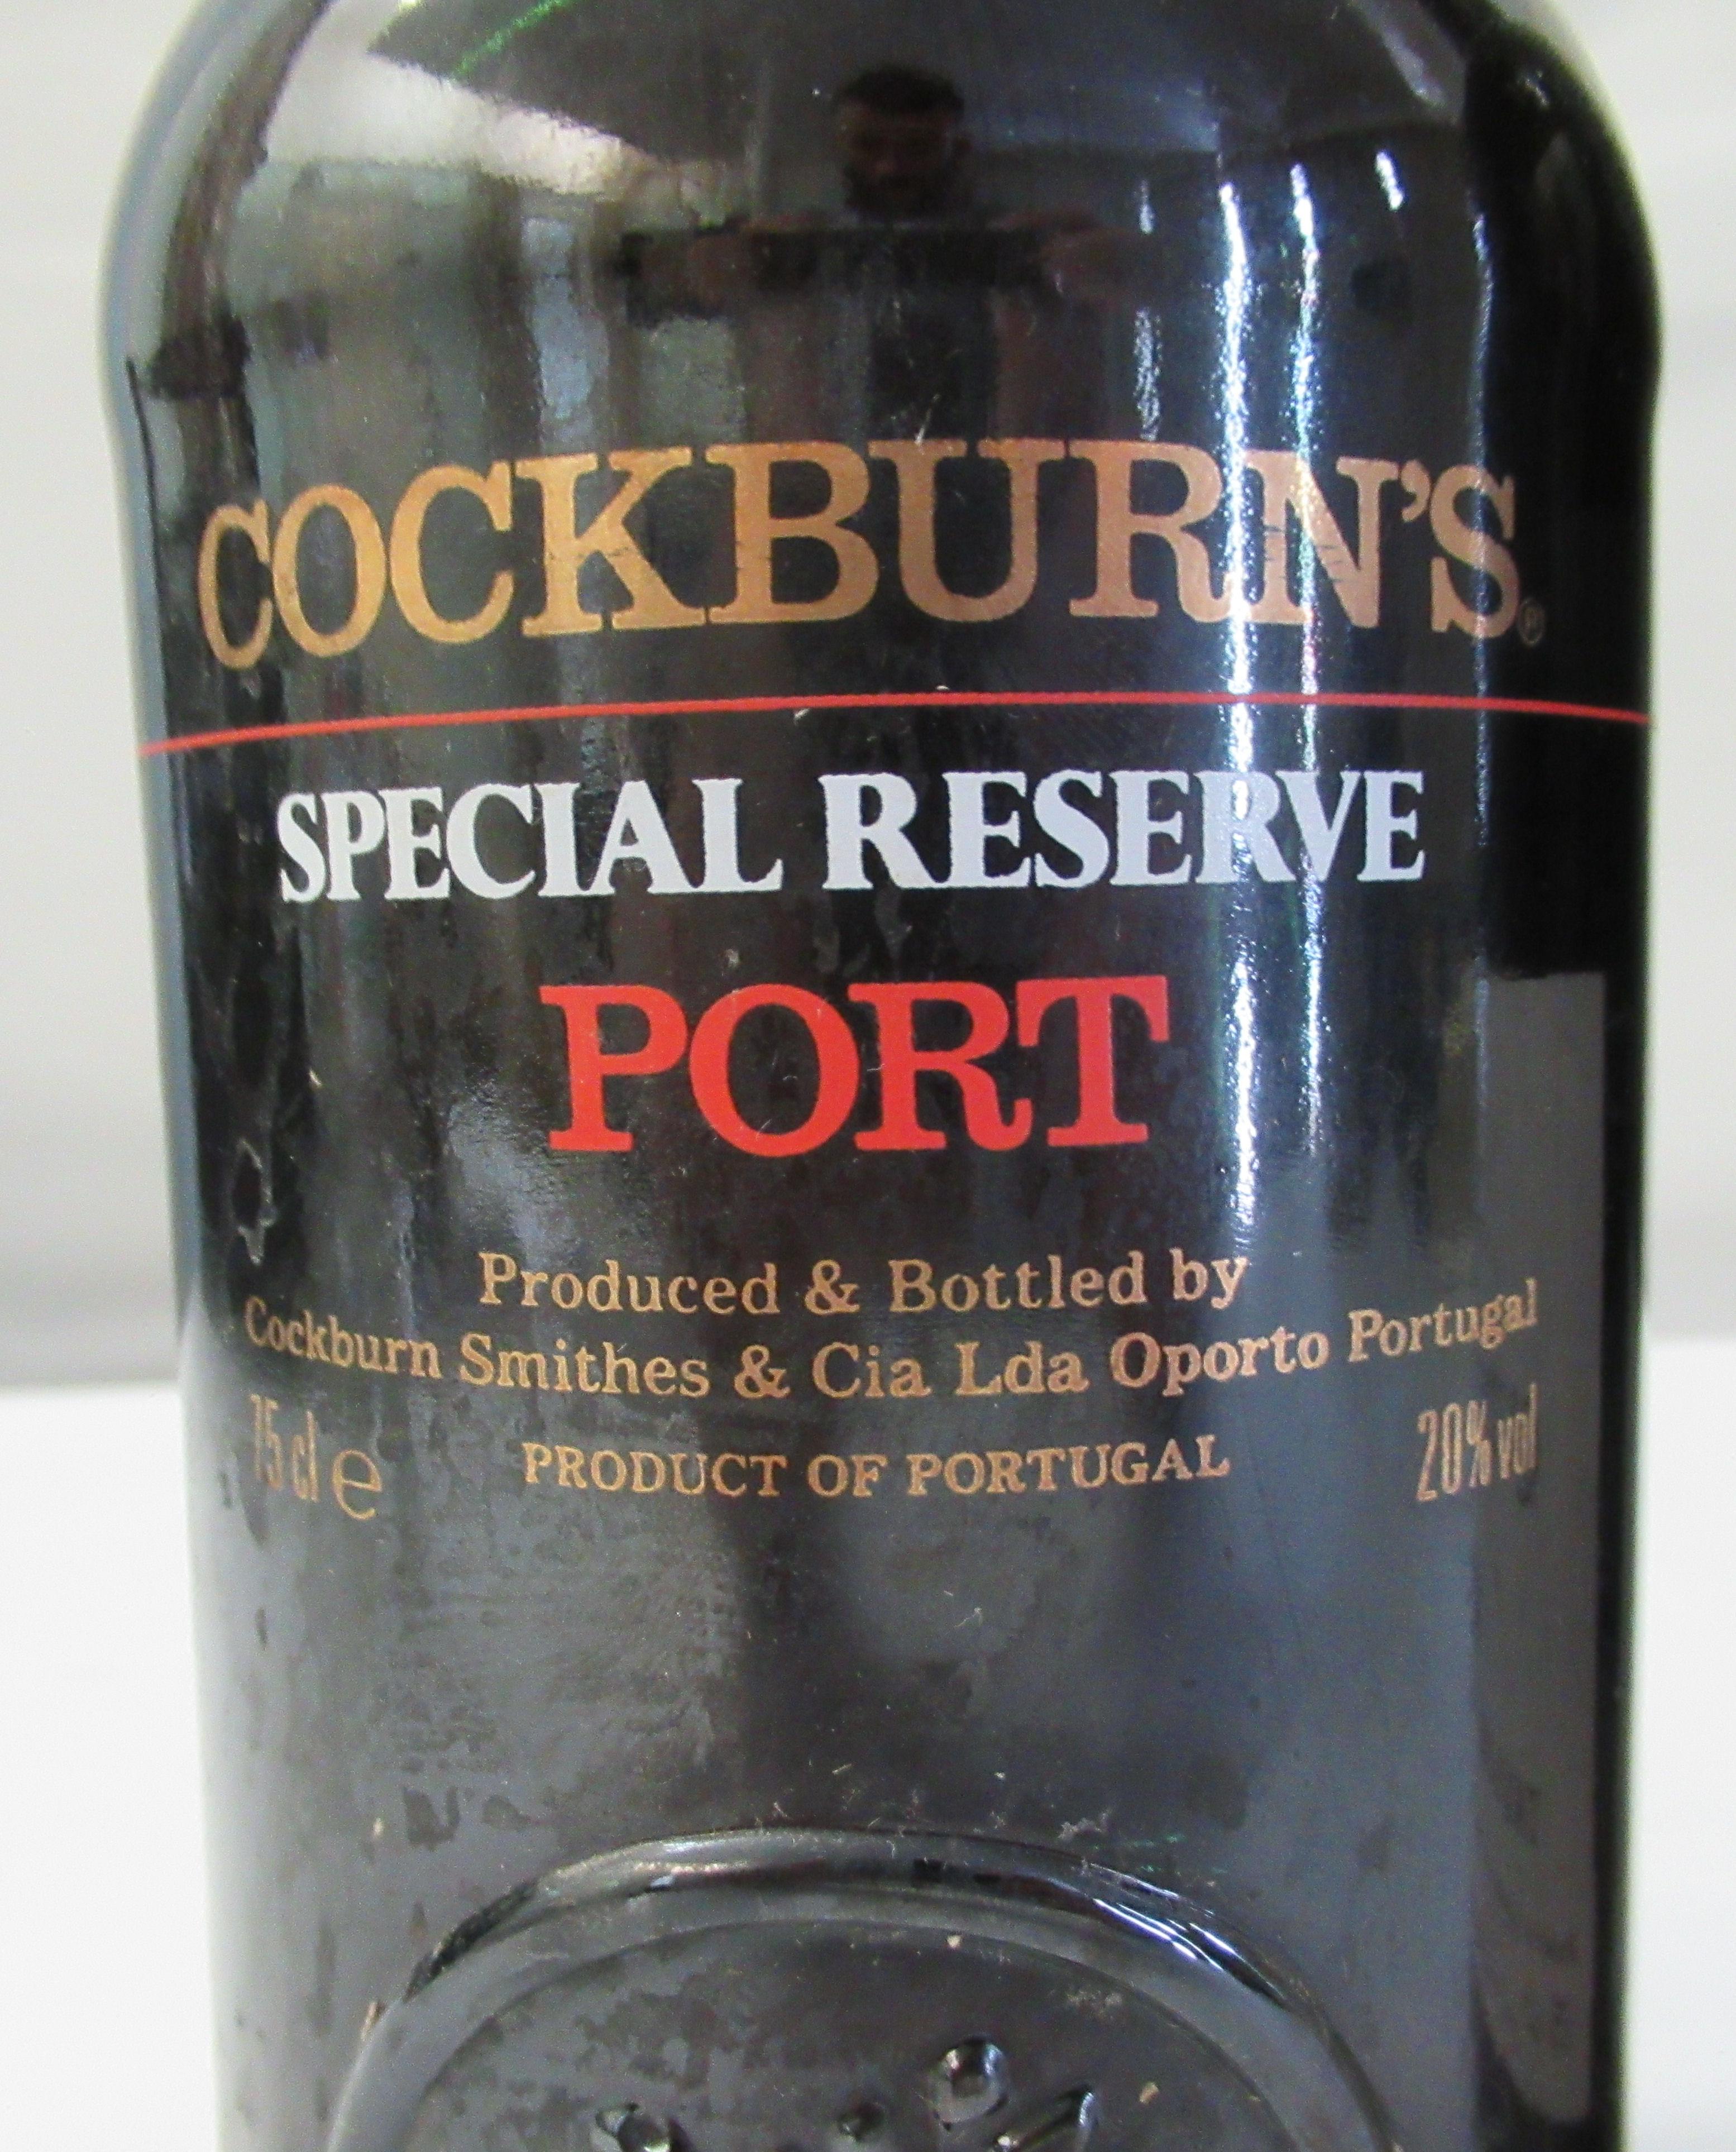 A bottle of Taylor's 1978 vintage port; and another bottle of Cockburn's port - Image 2 of 5